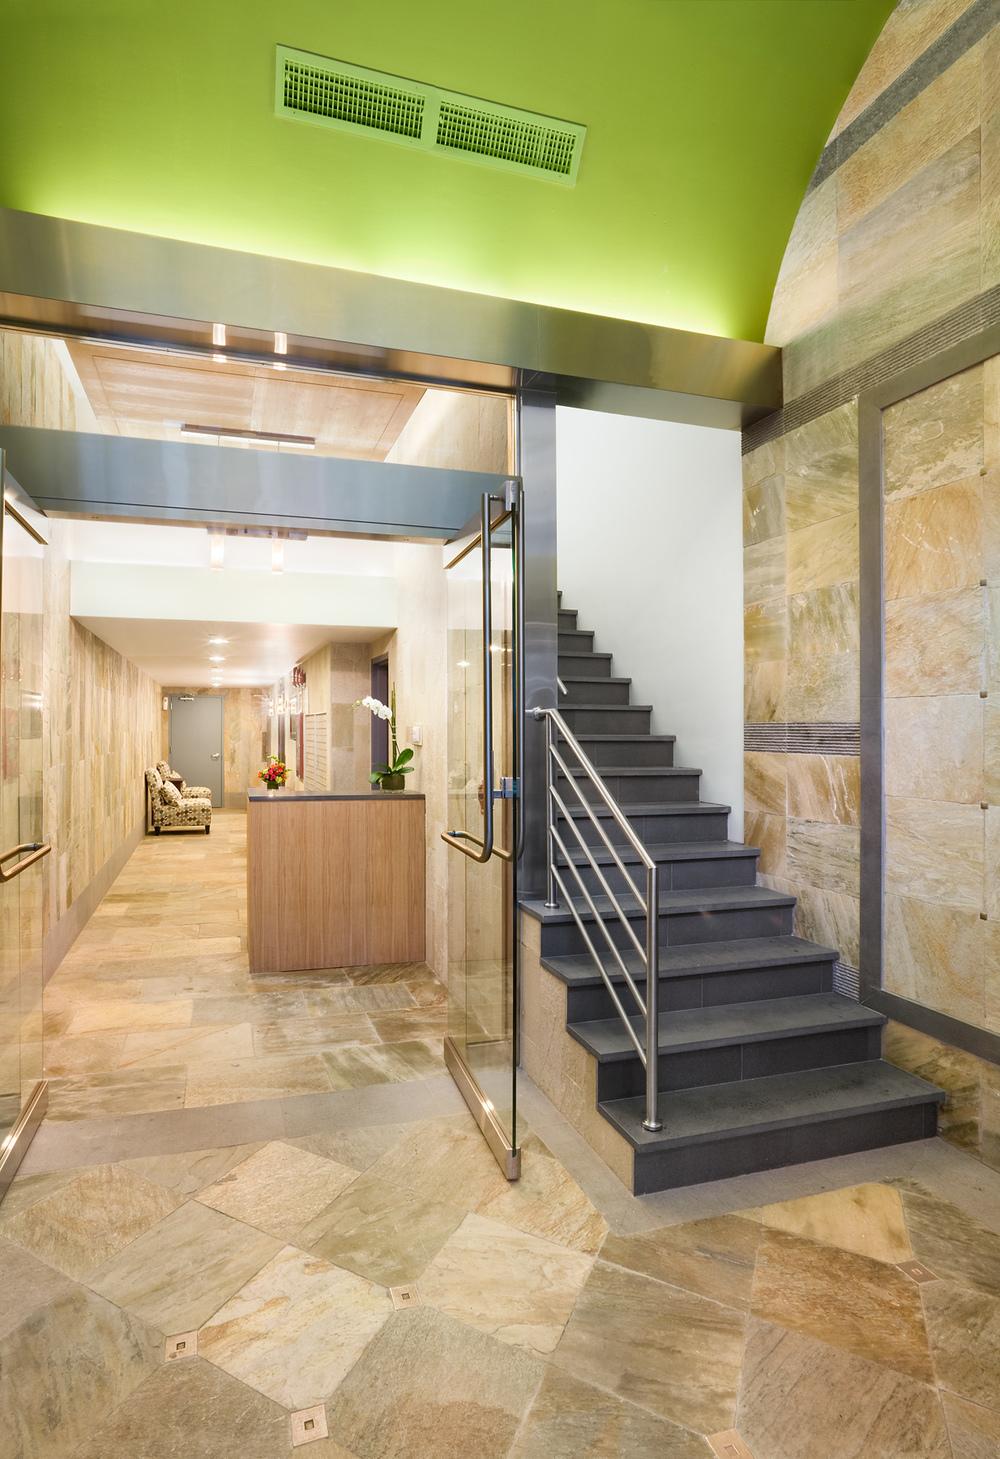 Tobin Parnes Design. NYC. Hospitality Design. Lobby Area.